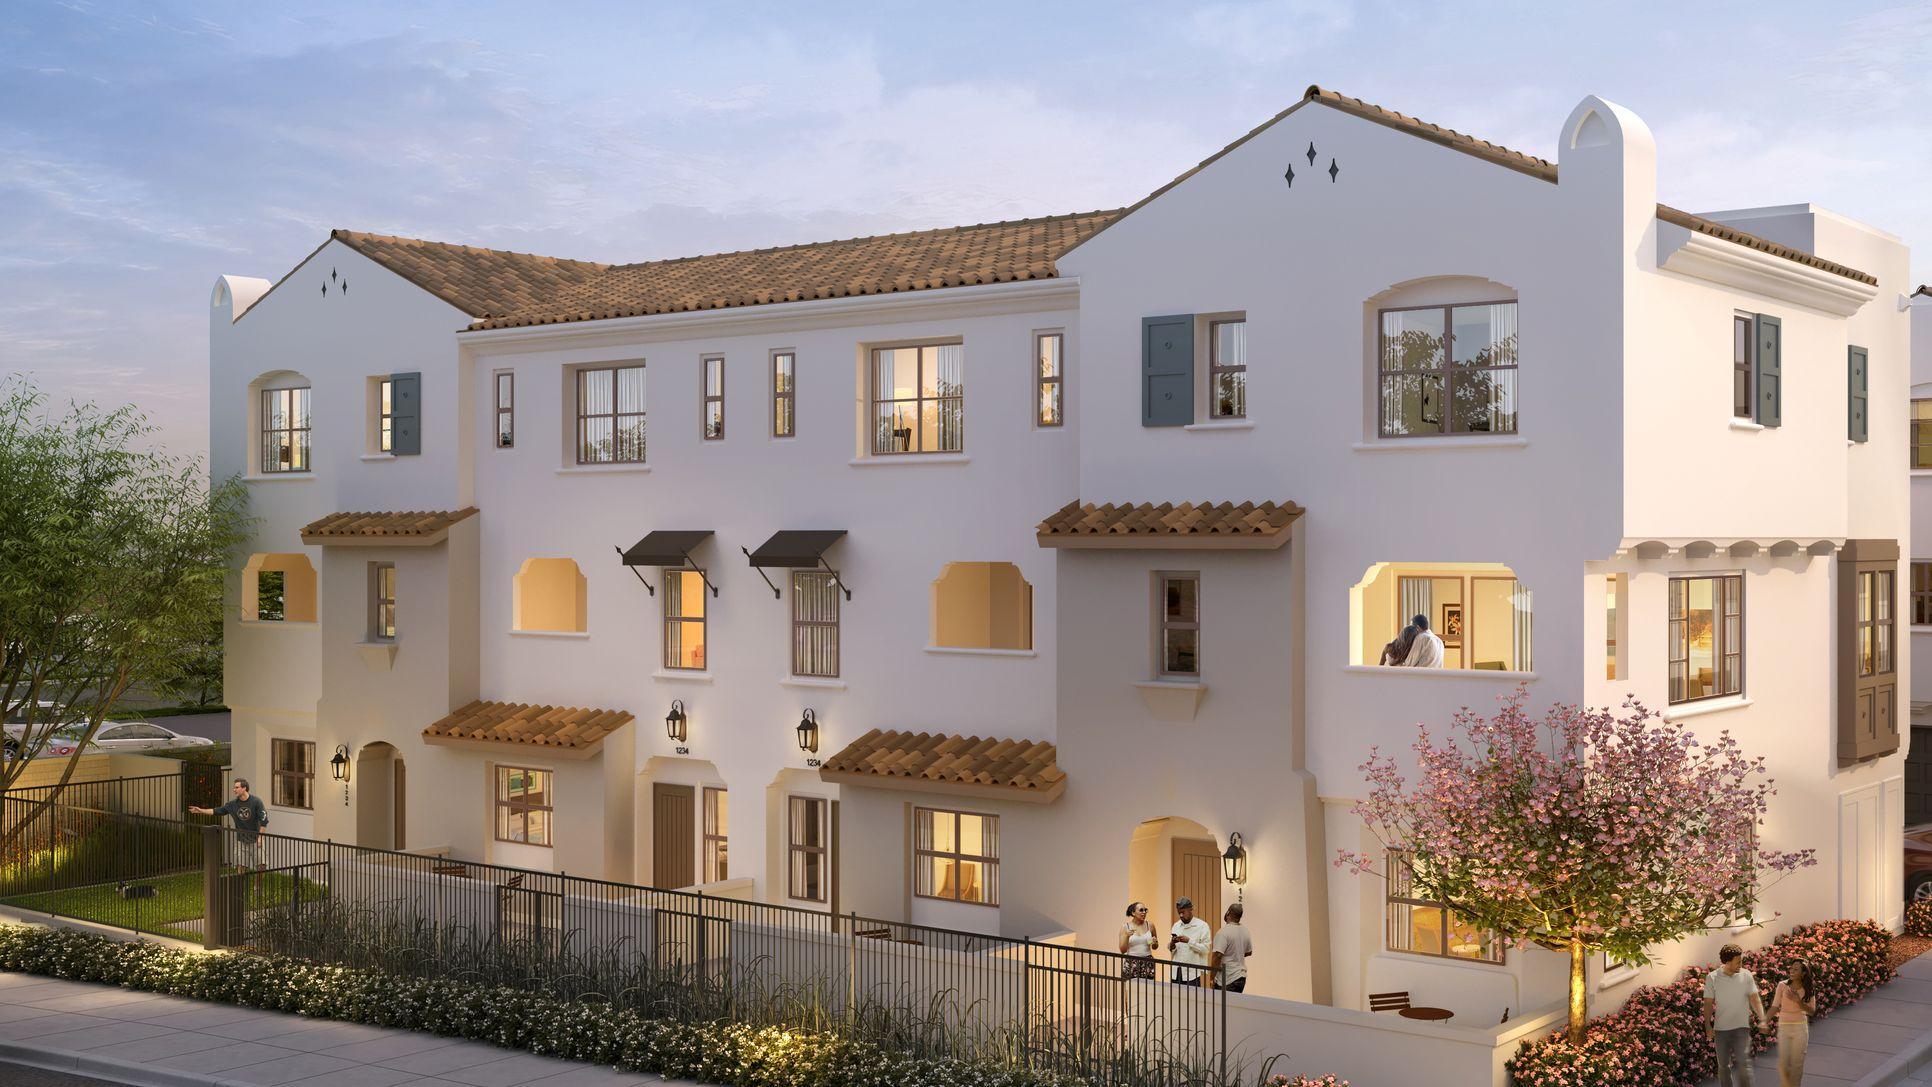 Paloma by Warmington Residential:Coming Soon to La Mirada